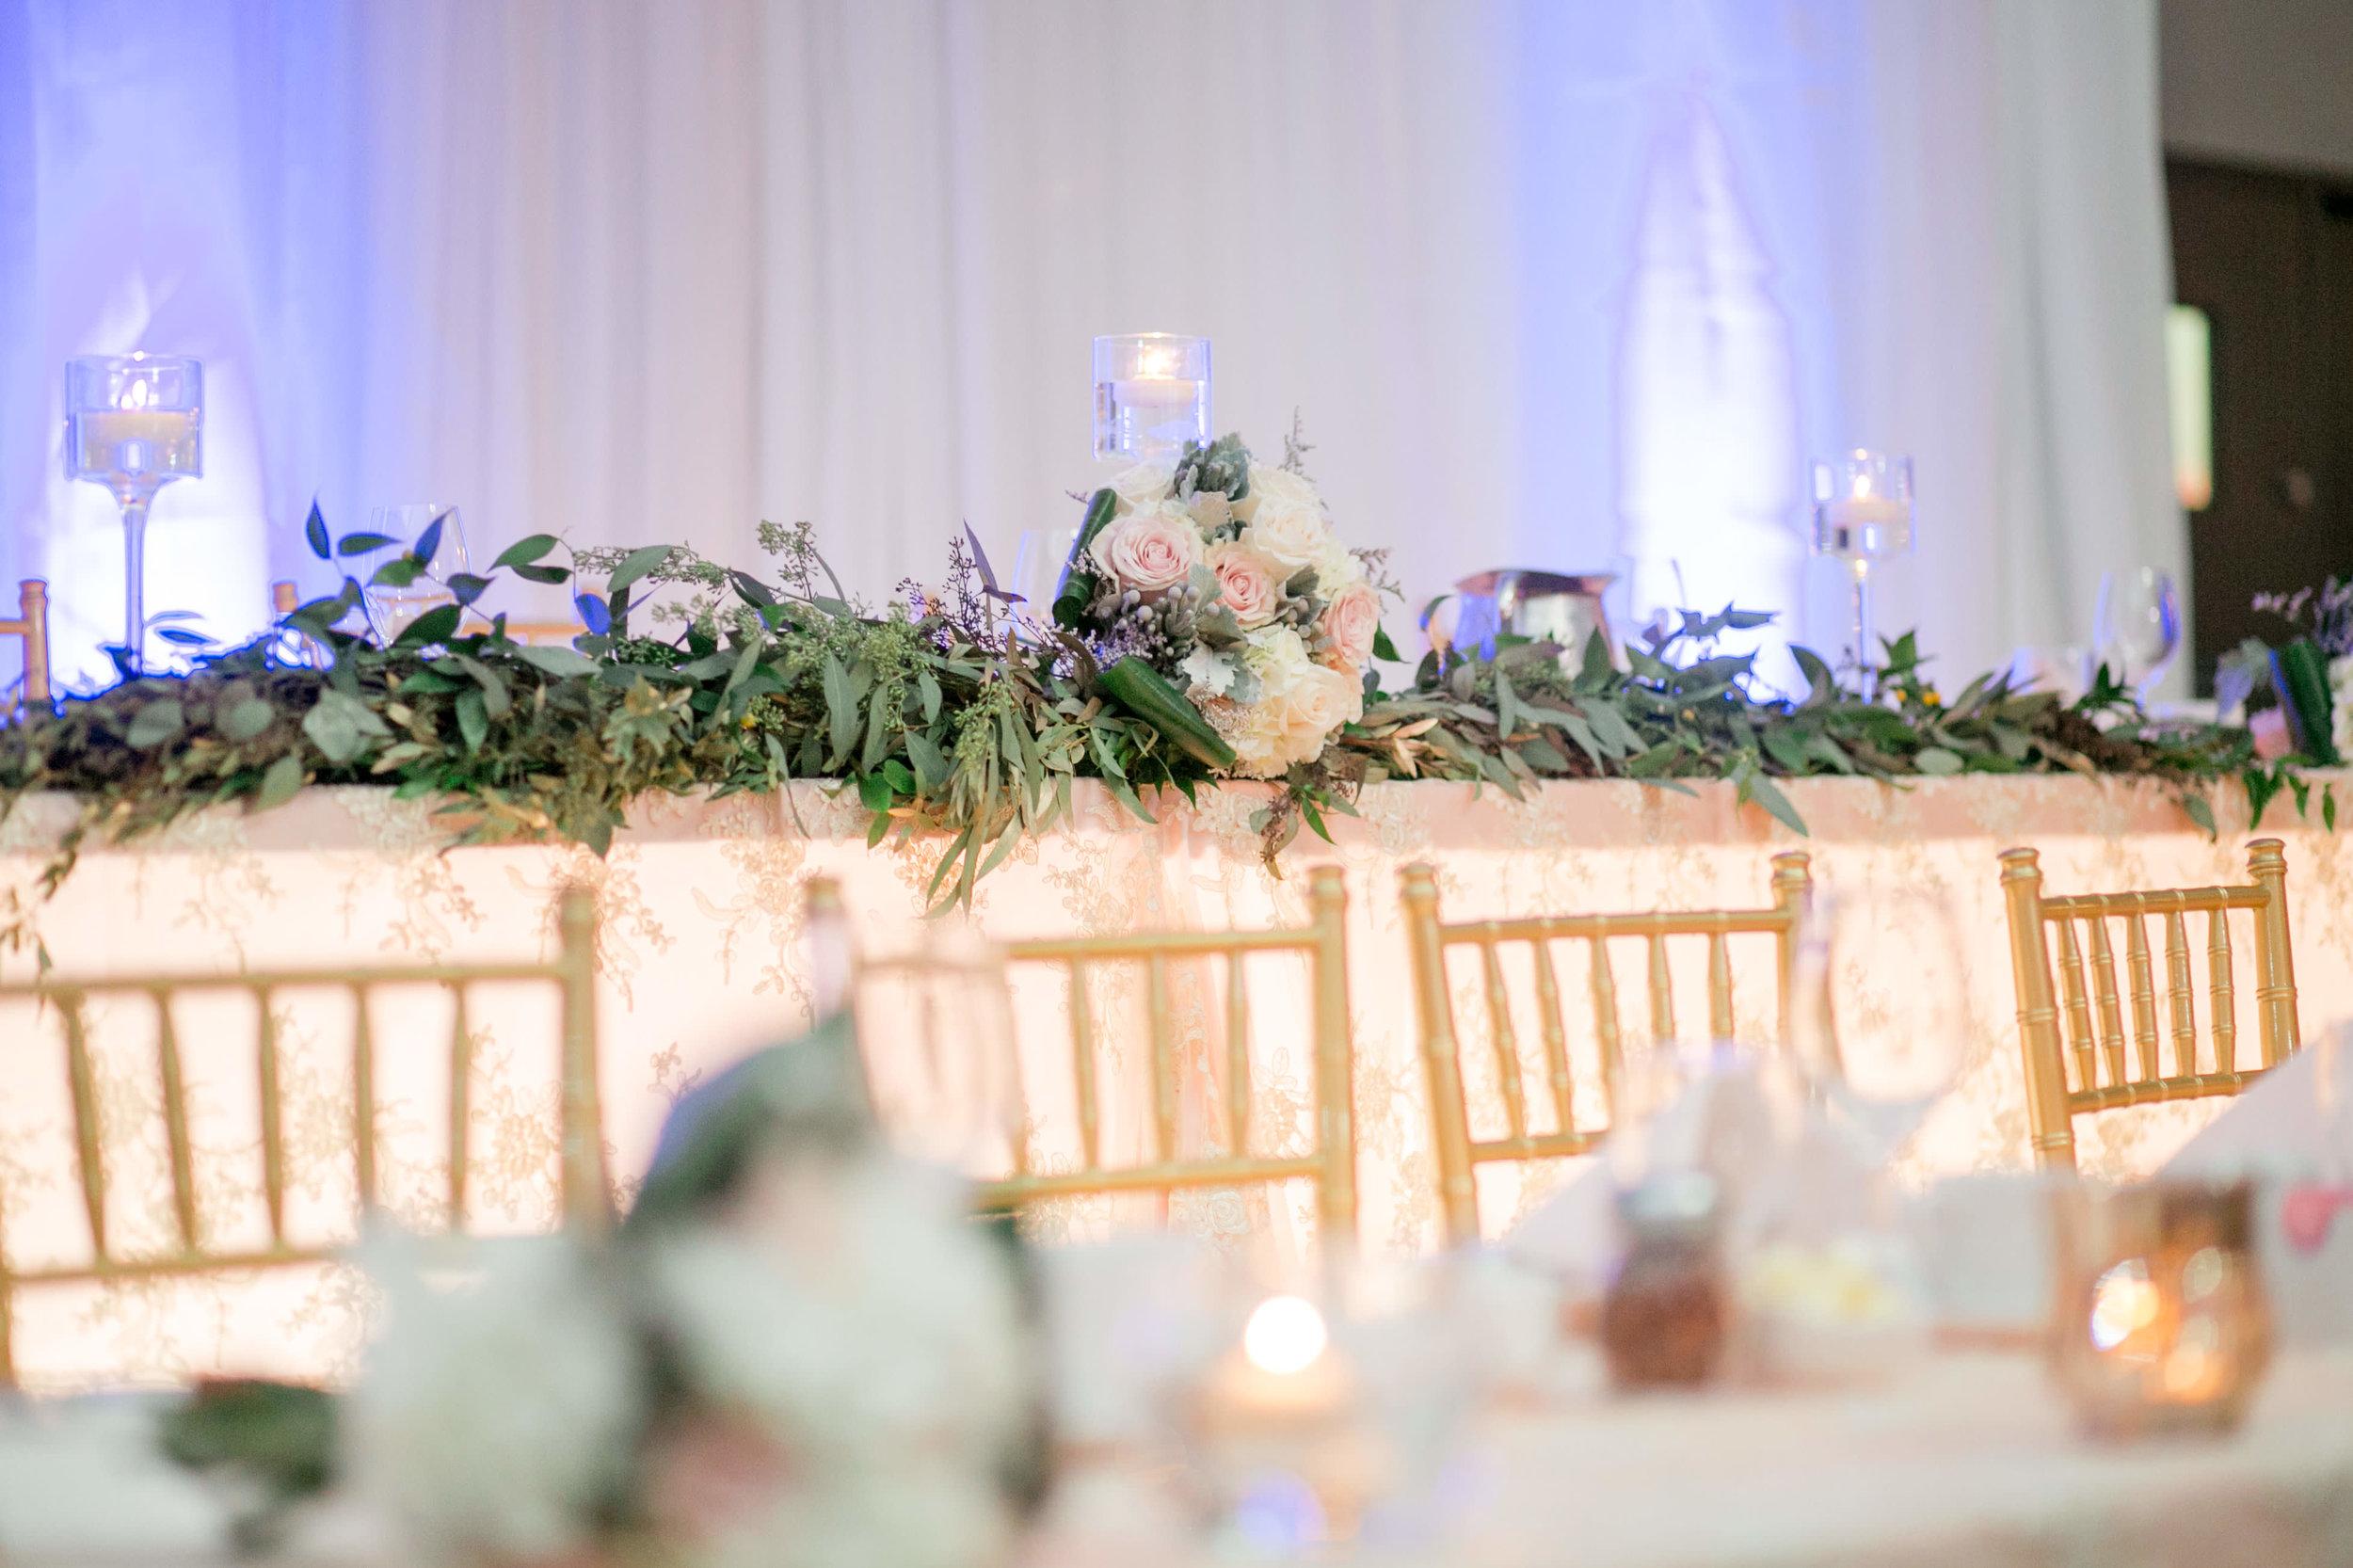 Stefanie___Bernard___Daniel_Ricci_Weddings_High_Res._Finals__445.jpg